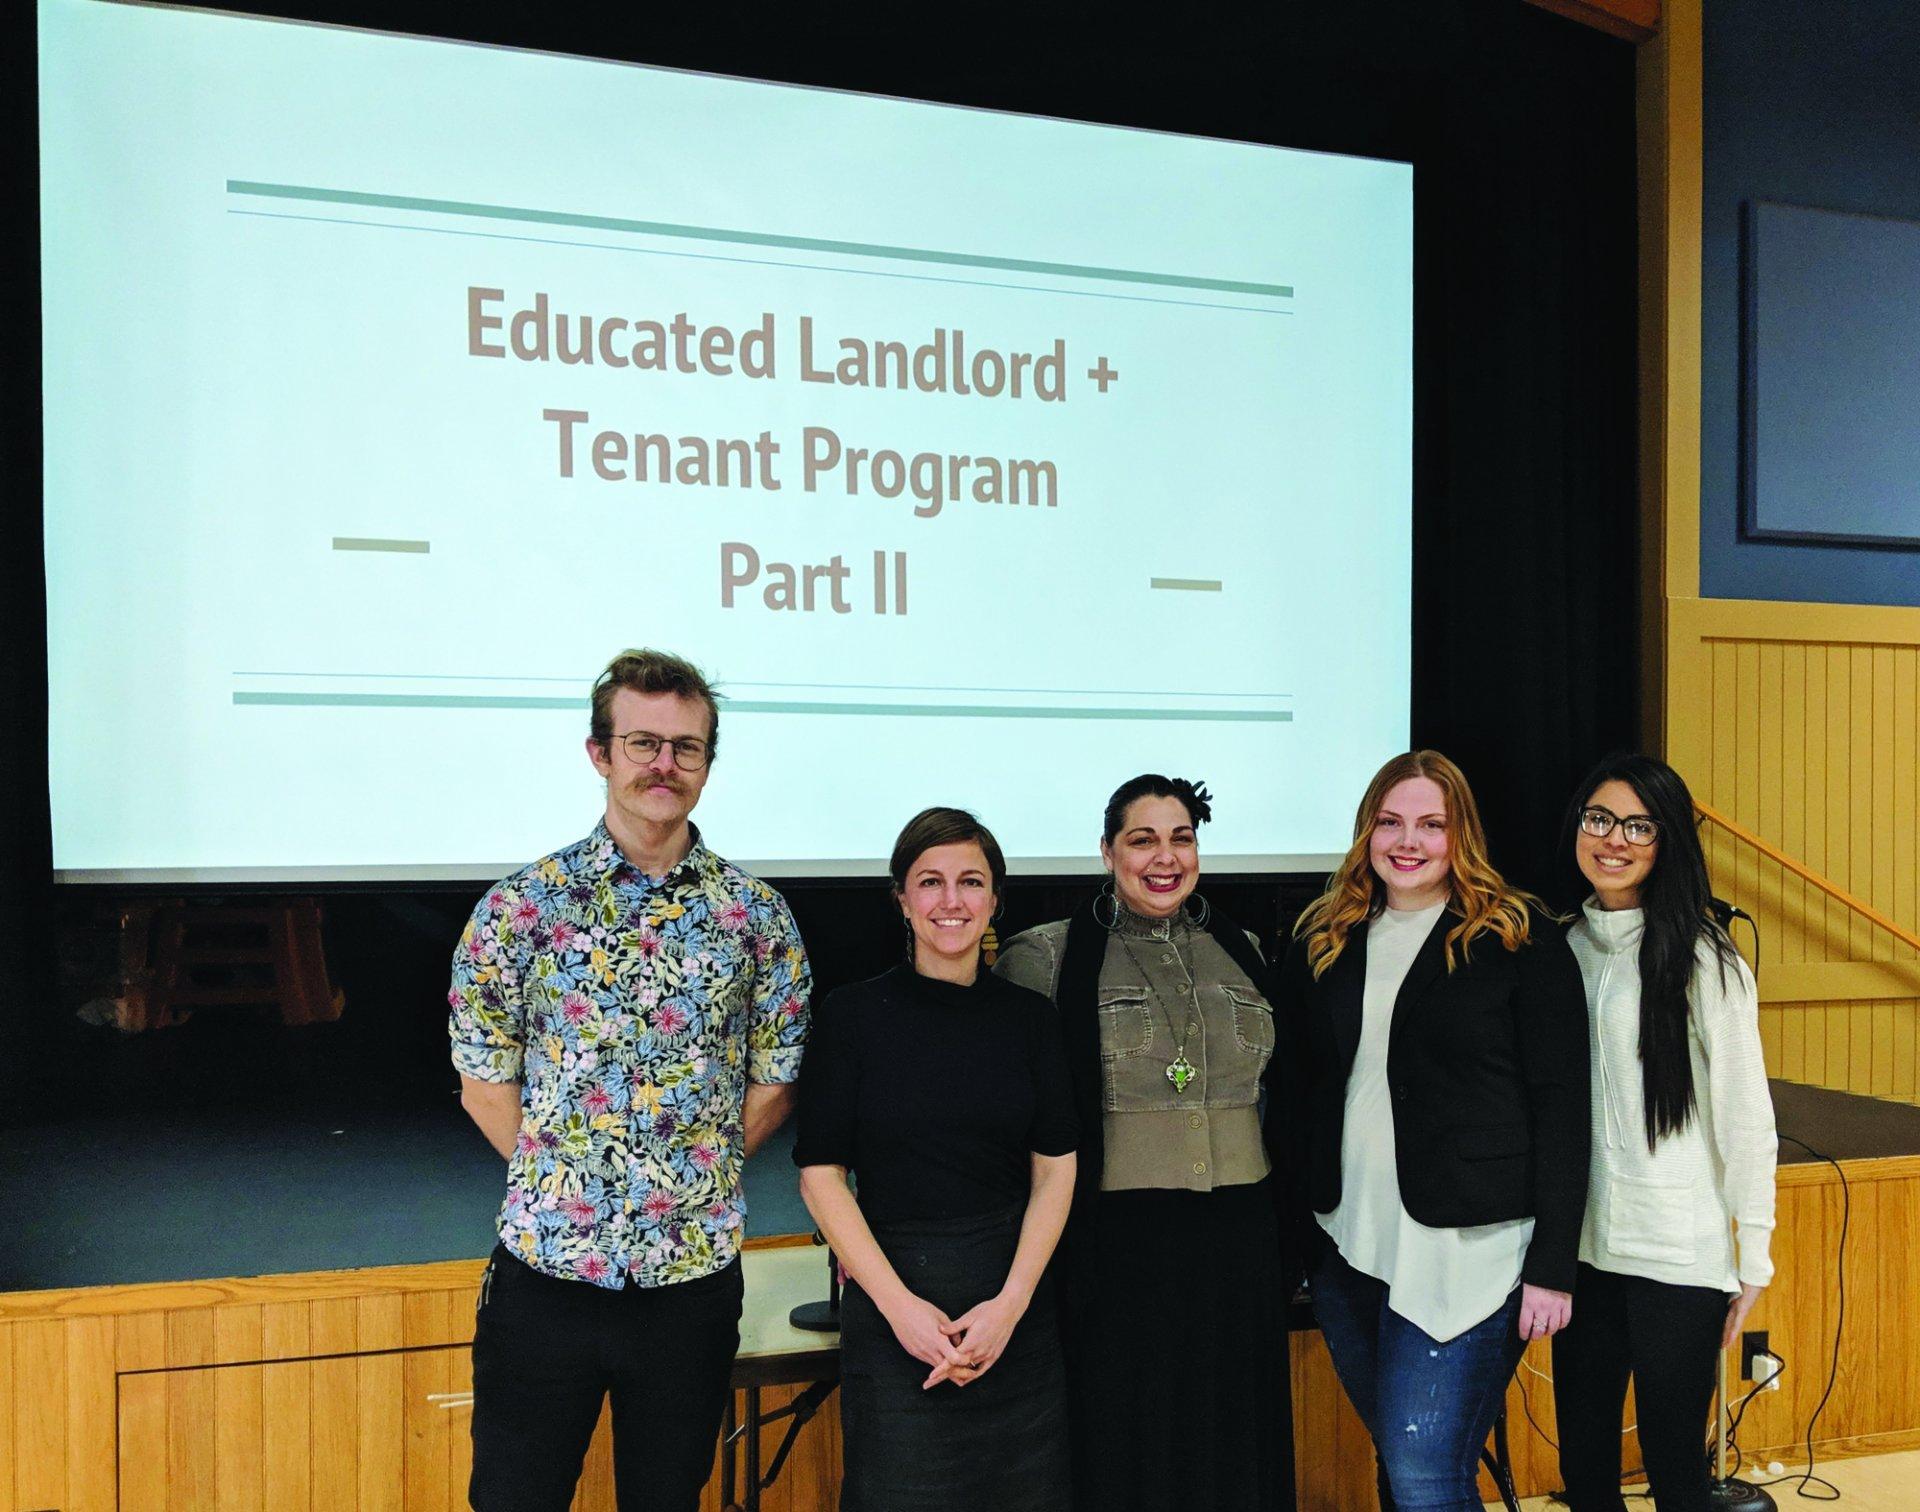 The team that built ELTP. From left: Jesse Richards, Sonya Woody, Chant'e Catt, Katelyn Harris and Ashley Bradshaw. | Photo by Jett Williams